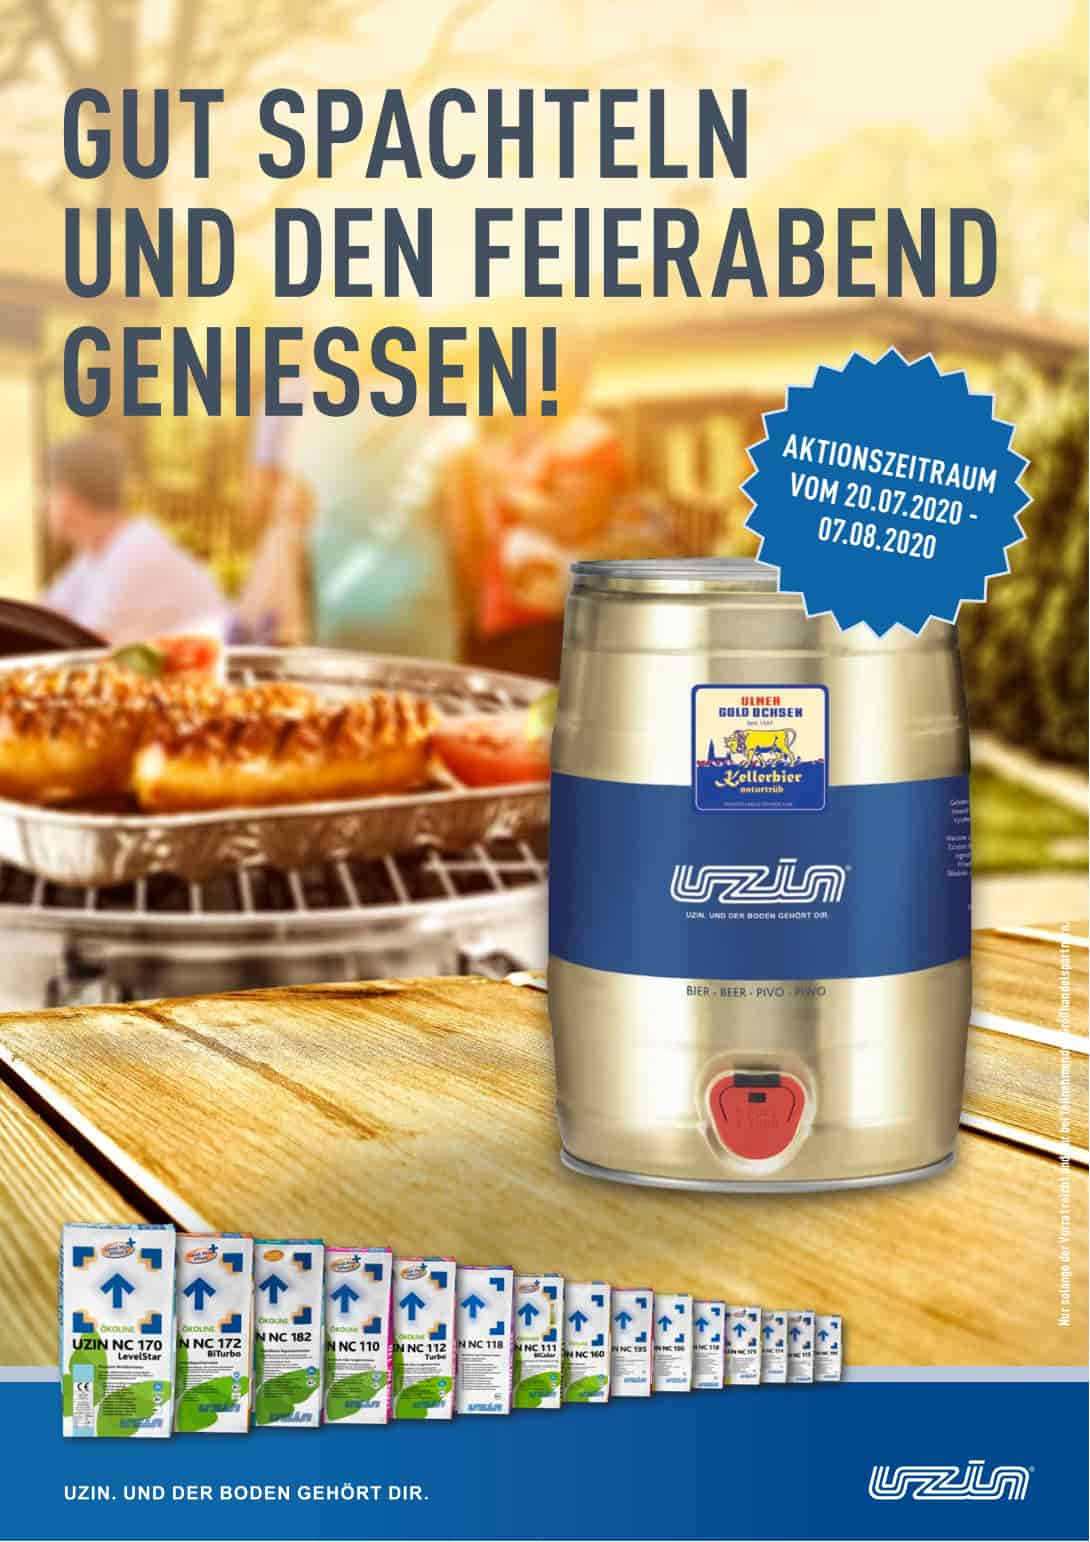 UZIN_Flyer_Promotion_Bierfass Bild 1